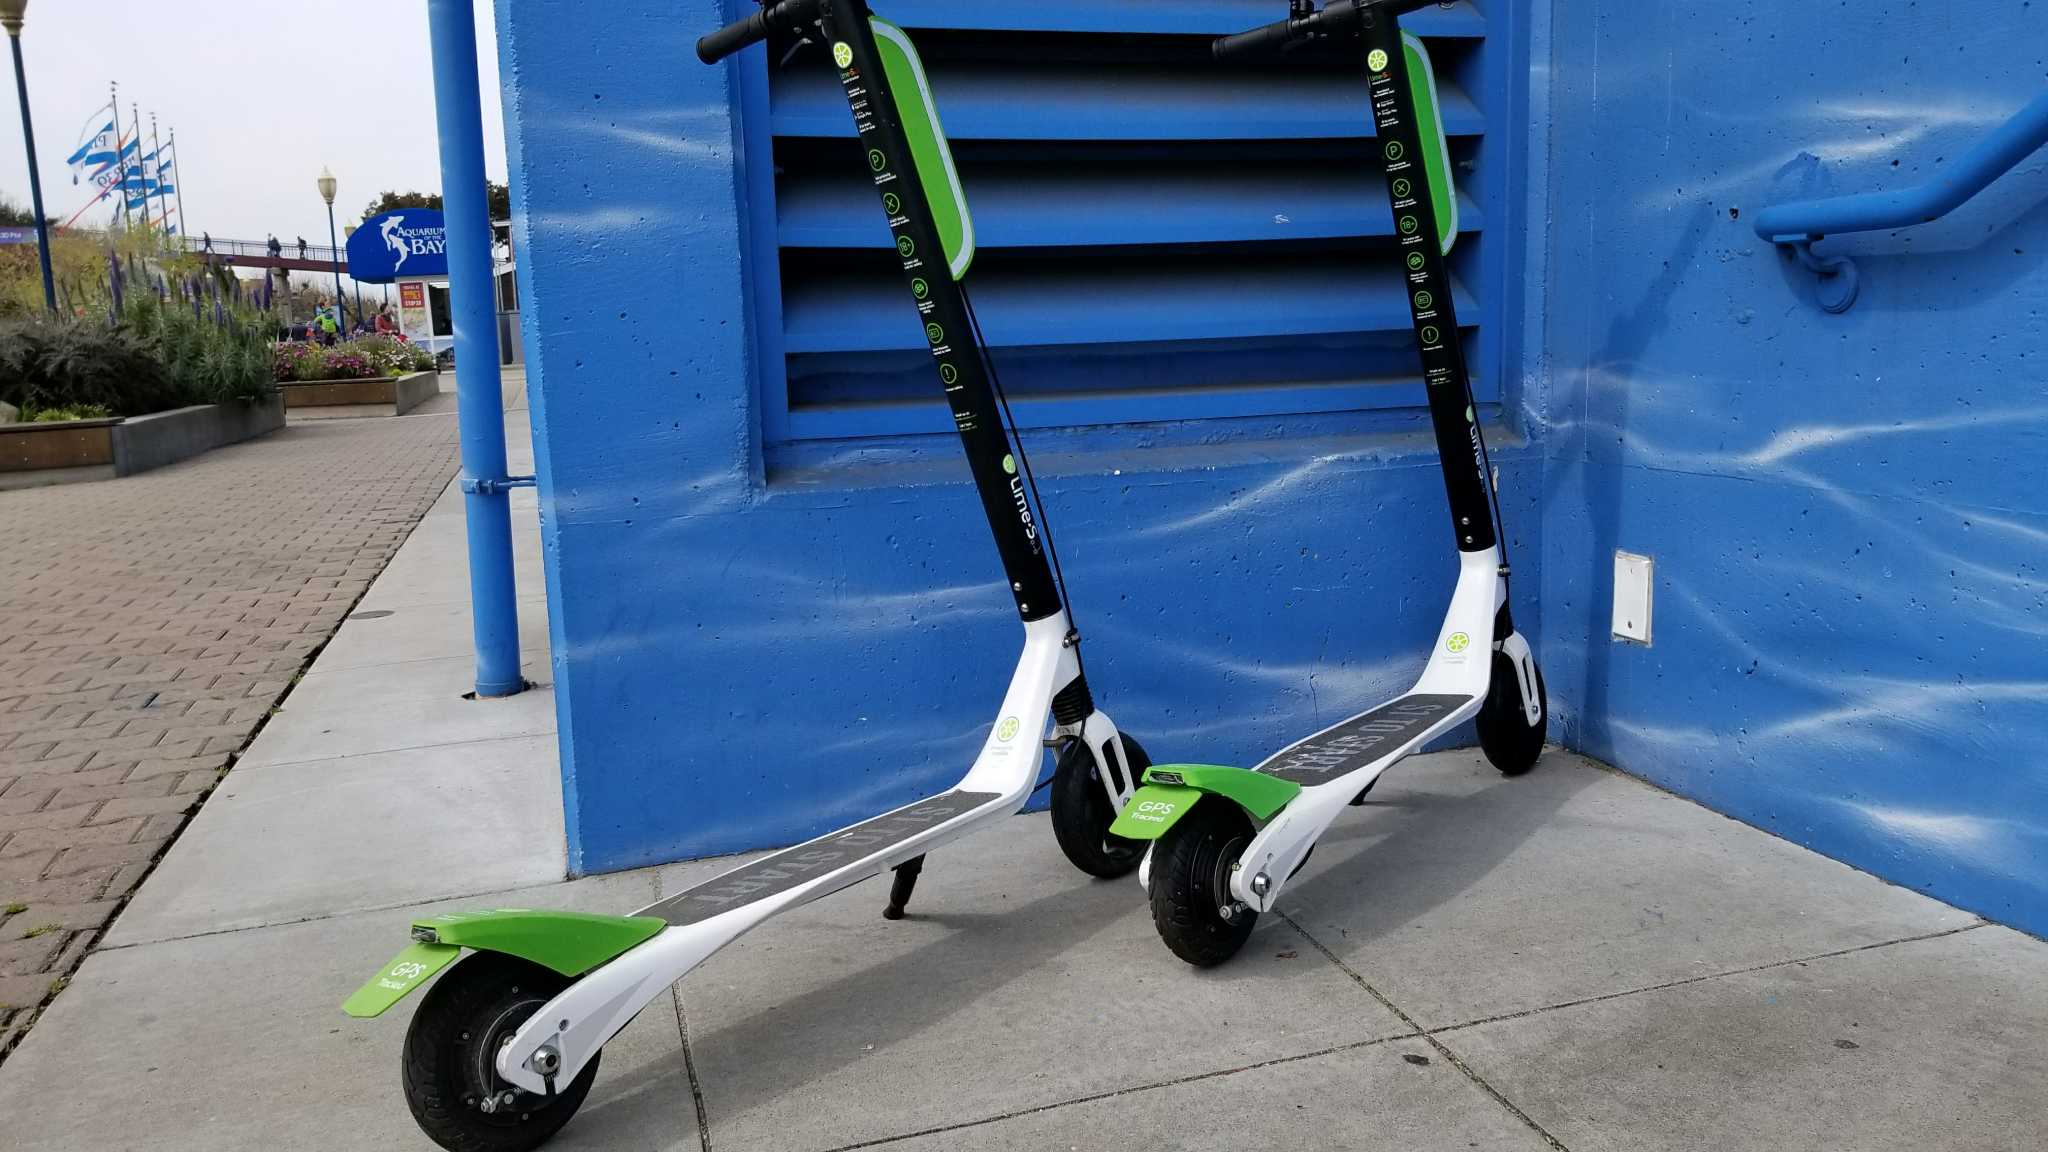 Scooter Rental San Francisco >> Lime Bike E Scooters Flood Sf Streets Sfbay